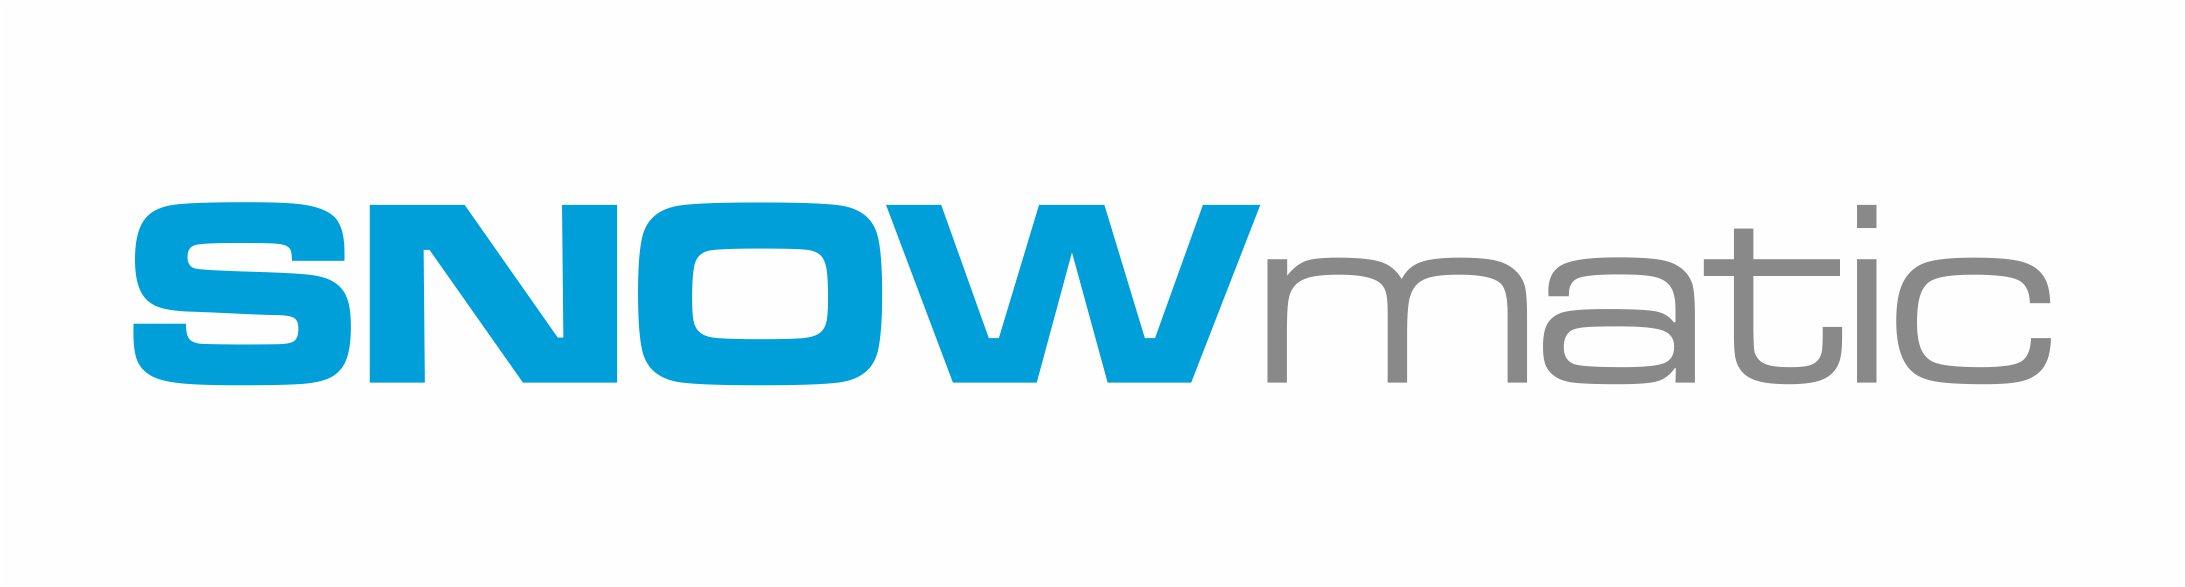 Logotyp Snowmatic kolor